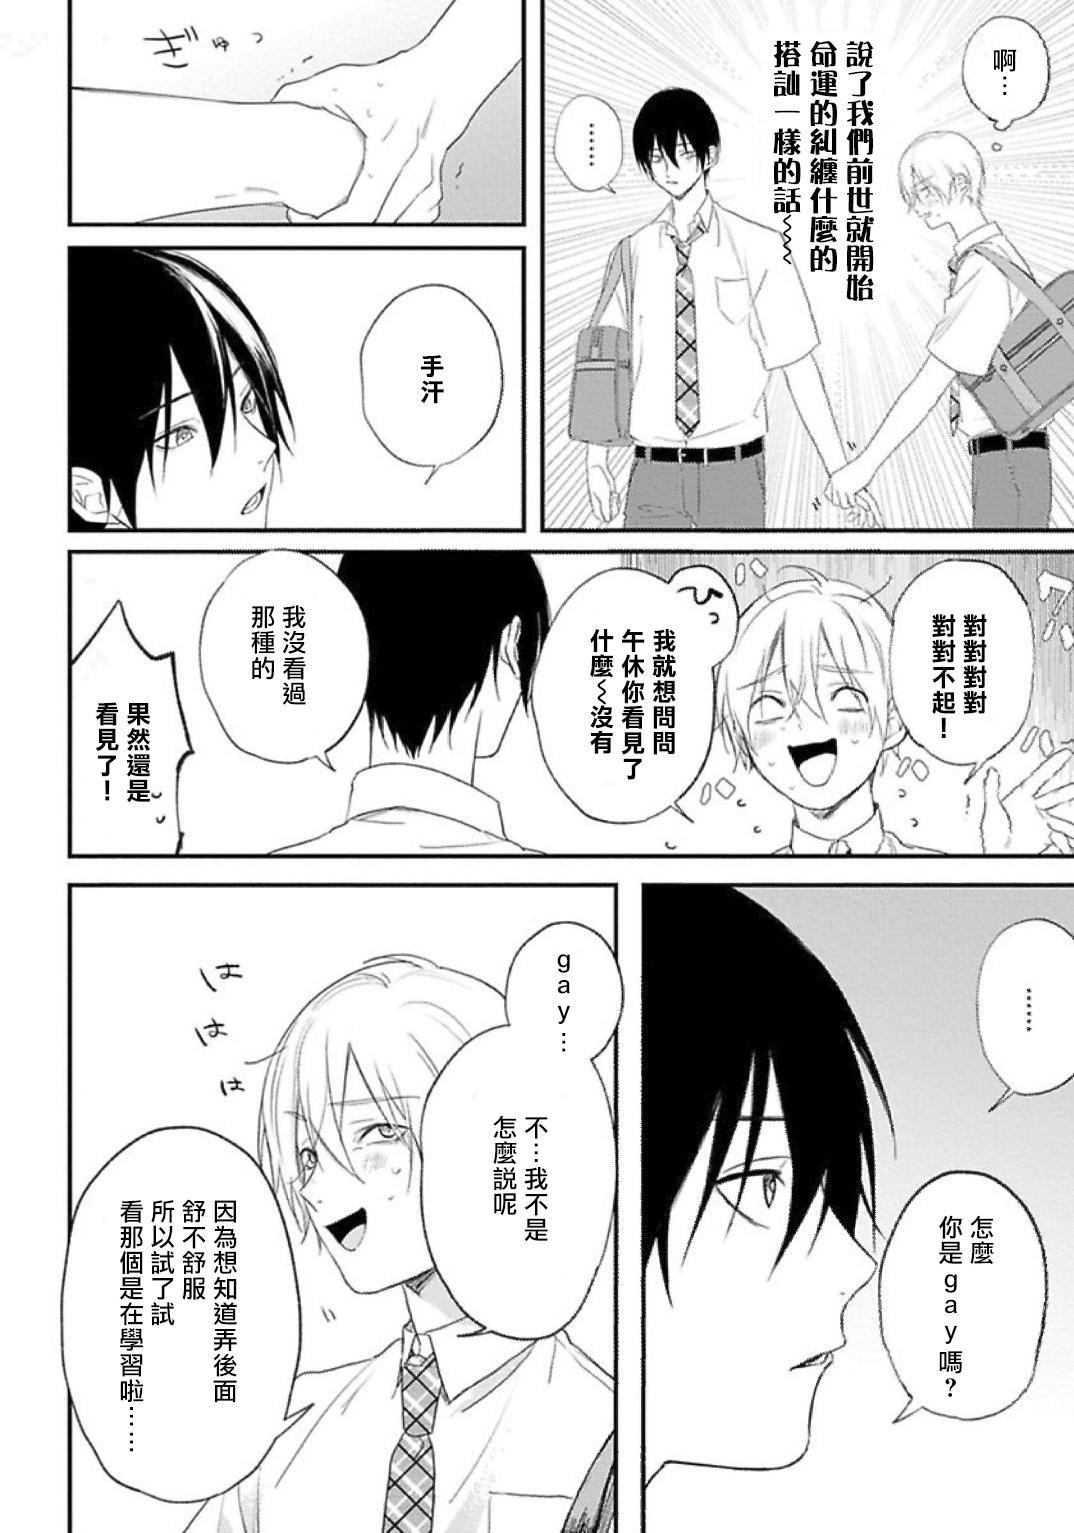 [Utata Hakuto] Houkago Virginity - Virginity afterschool 1-3 [Chinese] [拾荒者汉化组] [Digital] 17